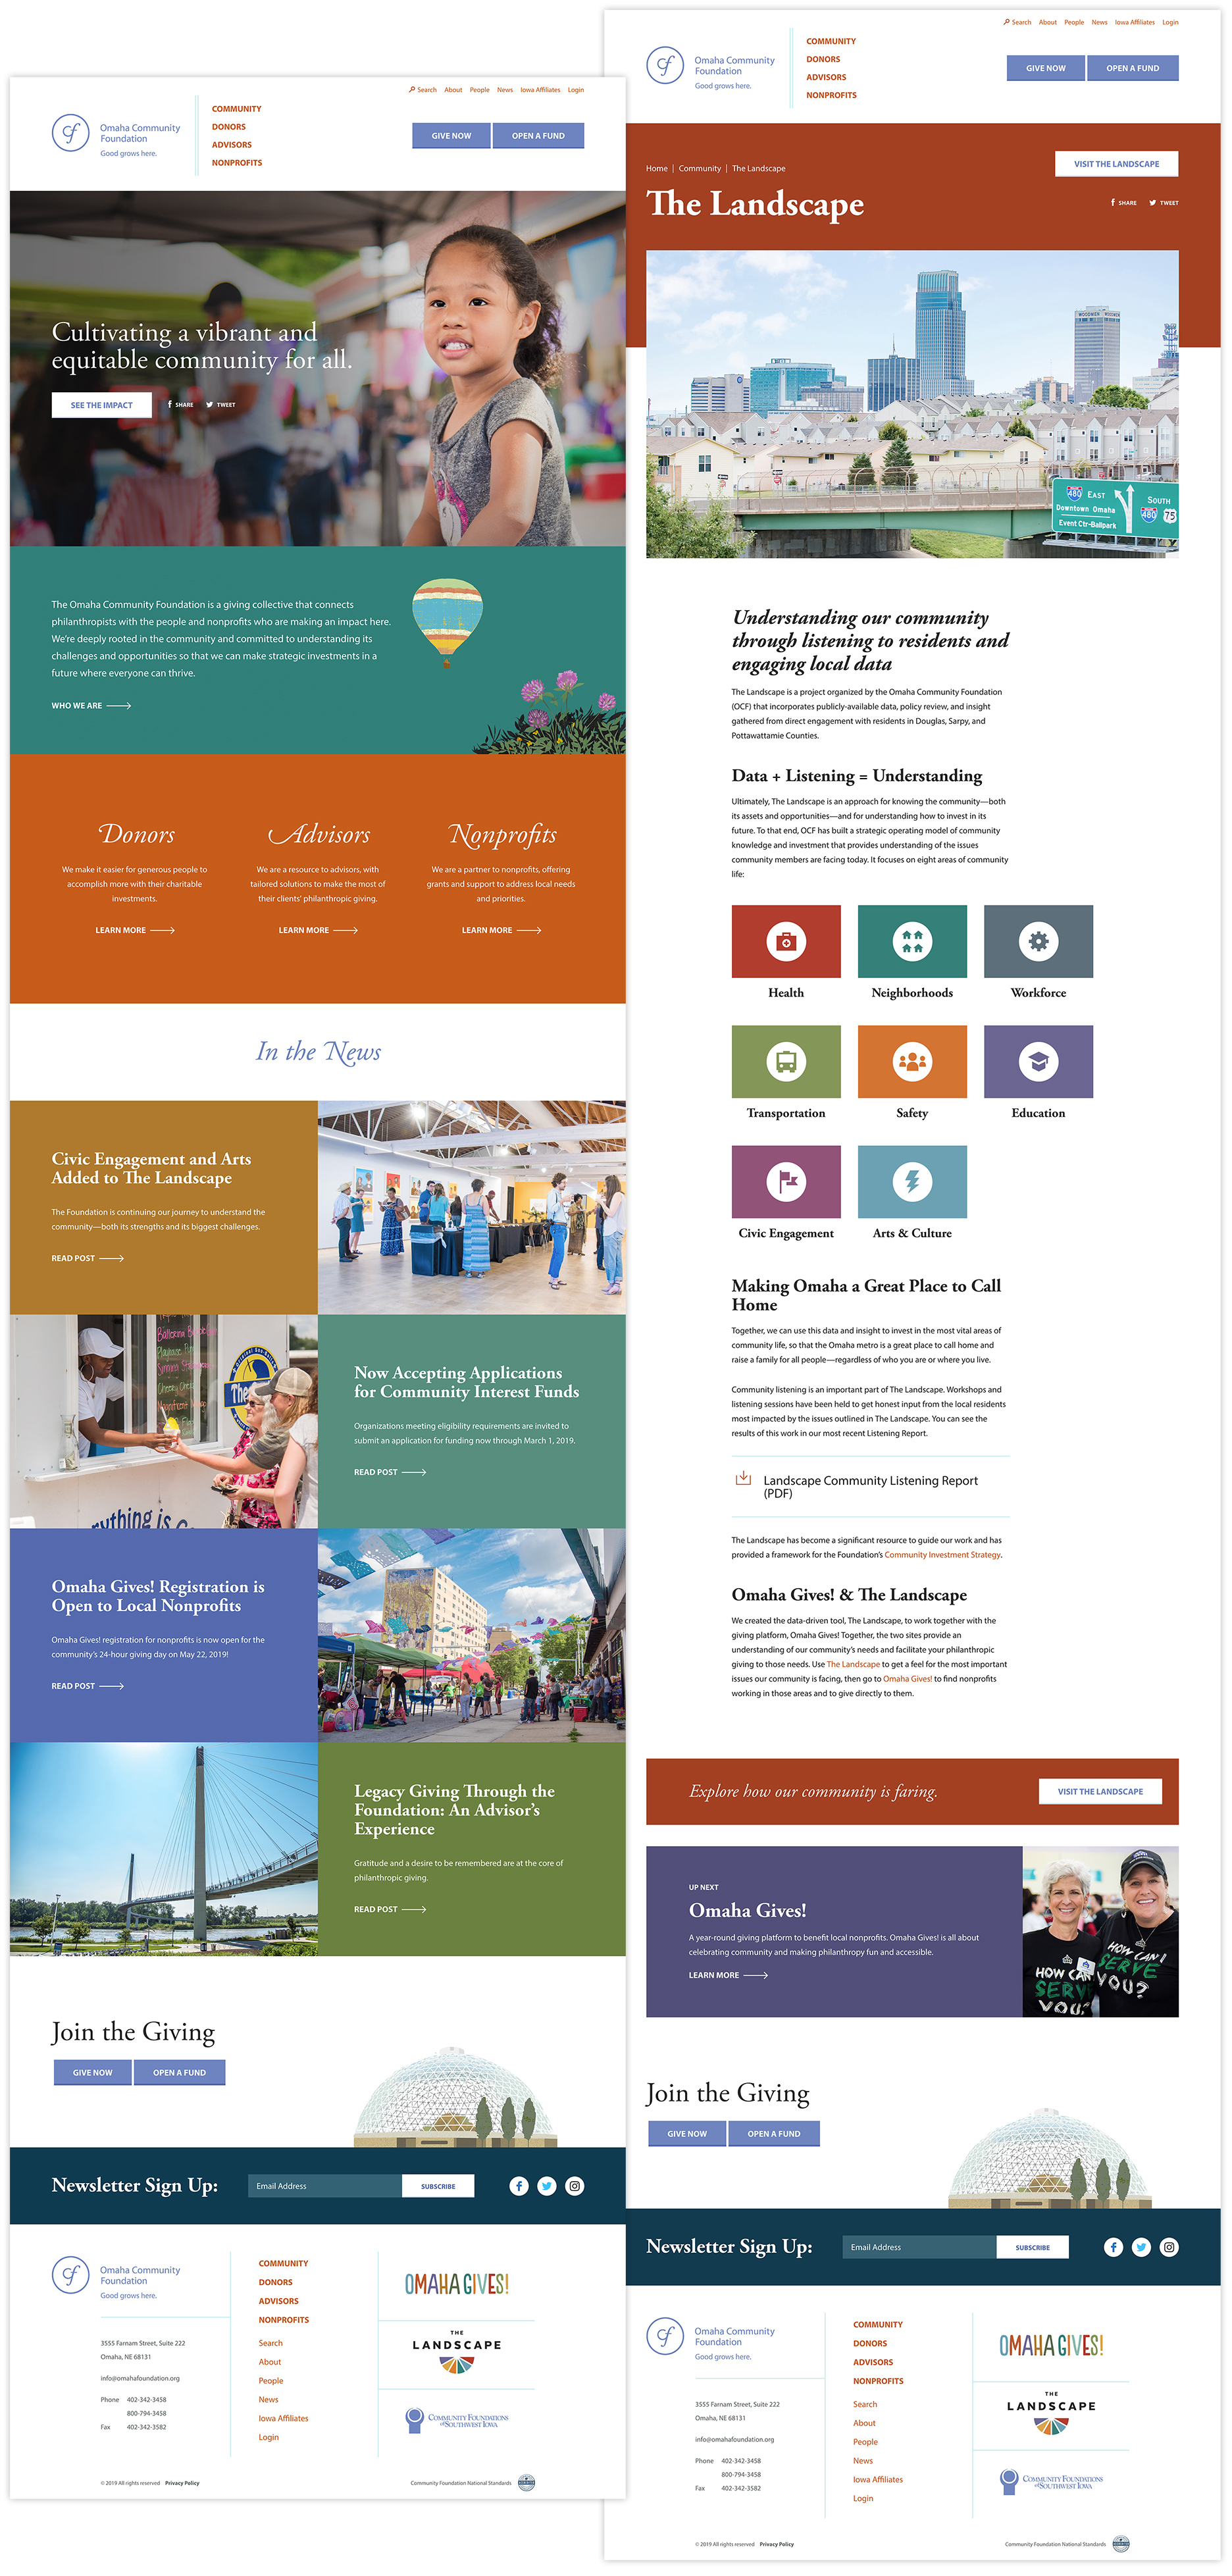 jkdc_ocf-pagedesigns-home.jpg